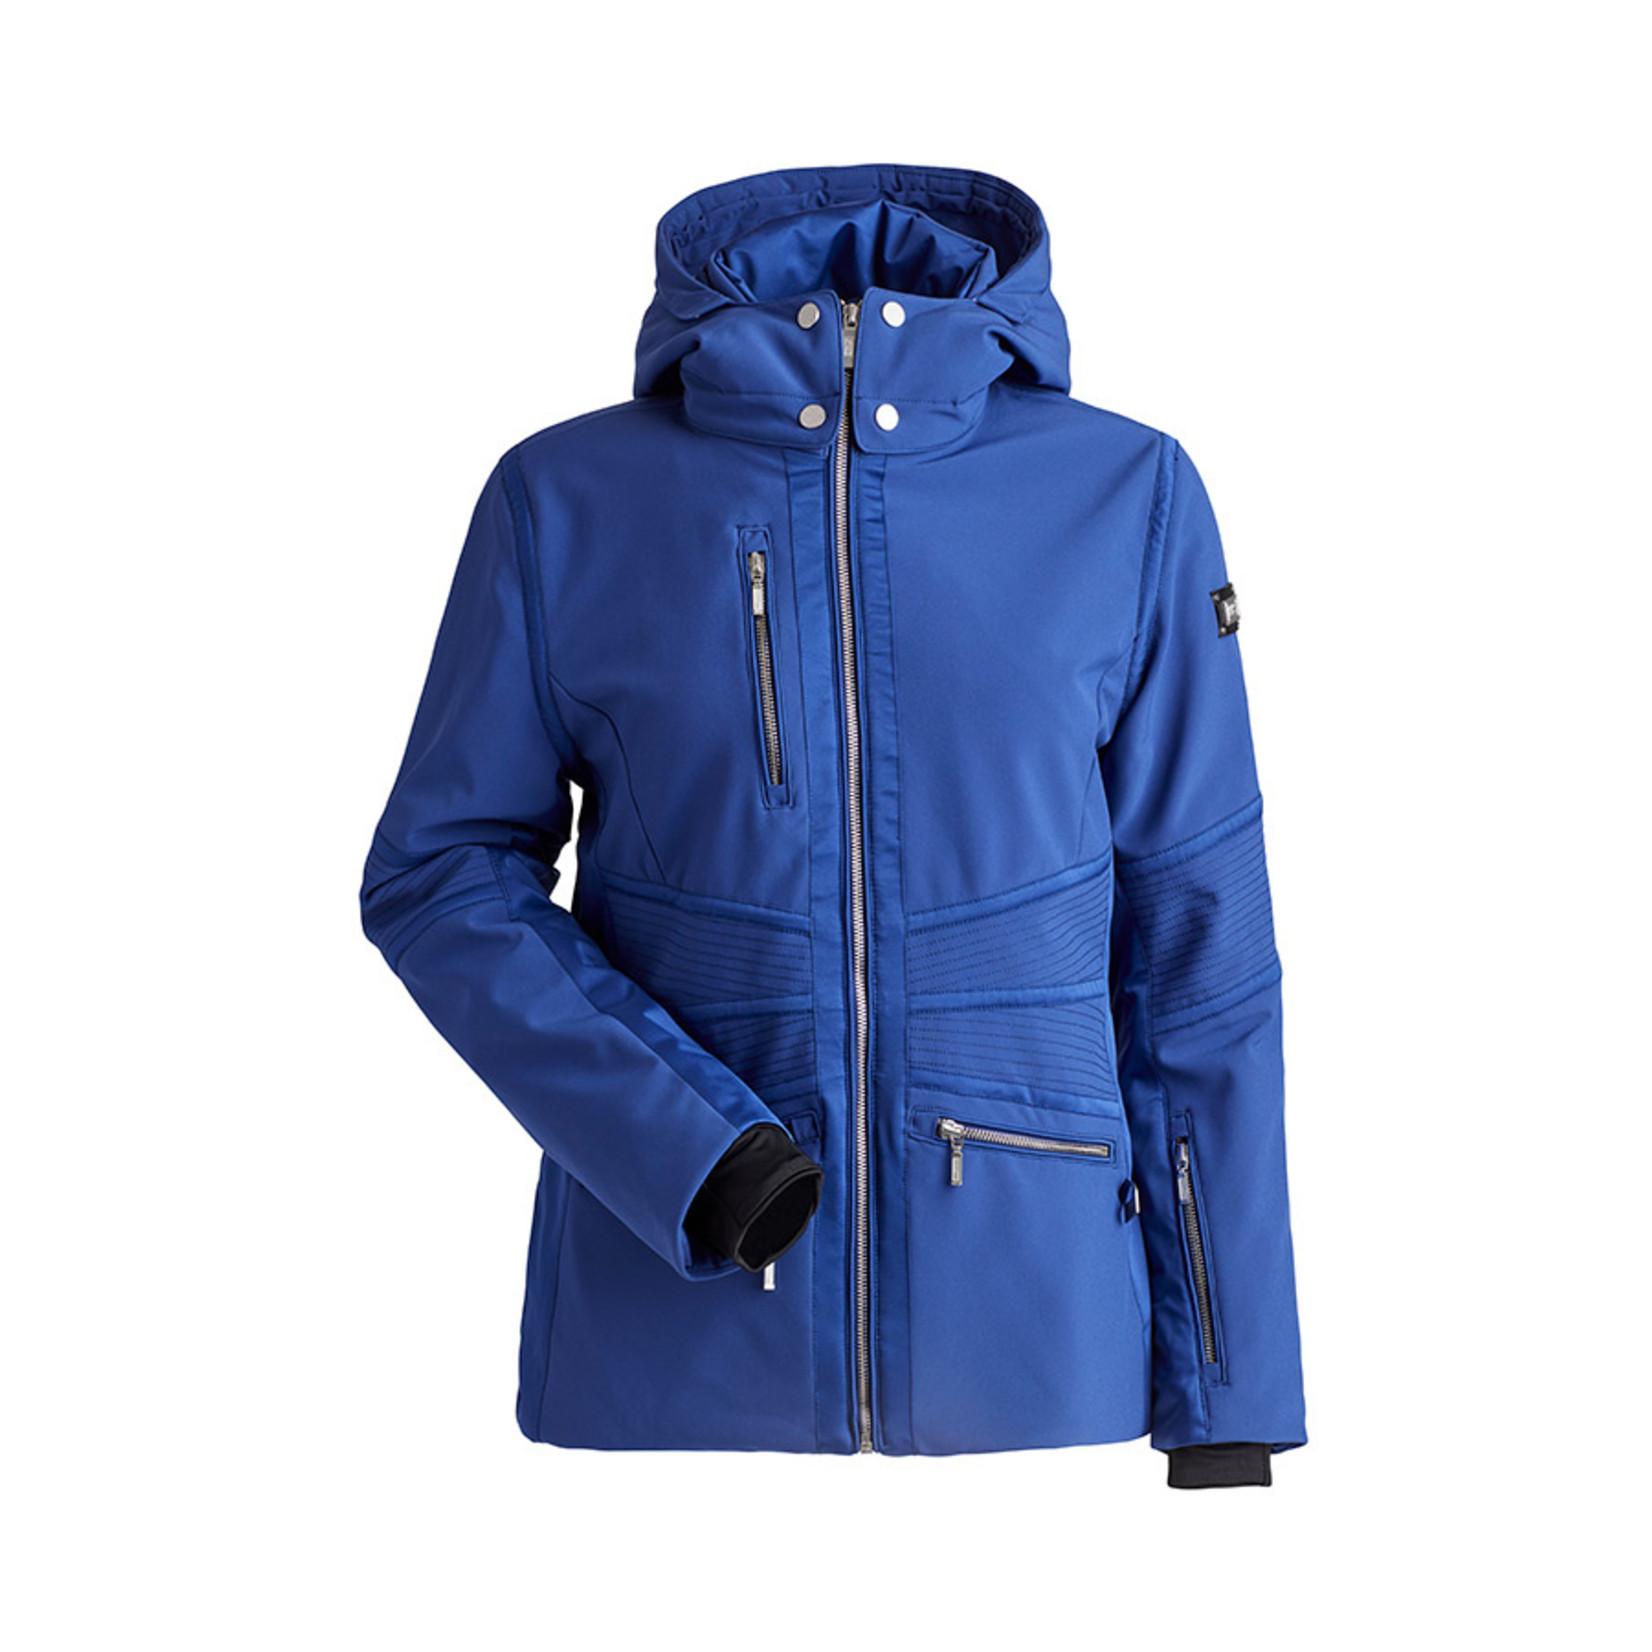 NILS NILS Carina Women's Jacket